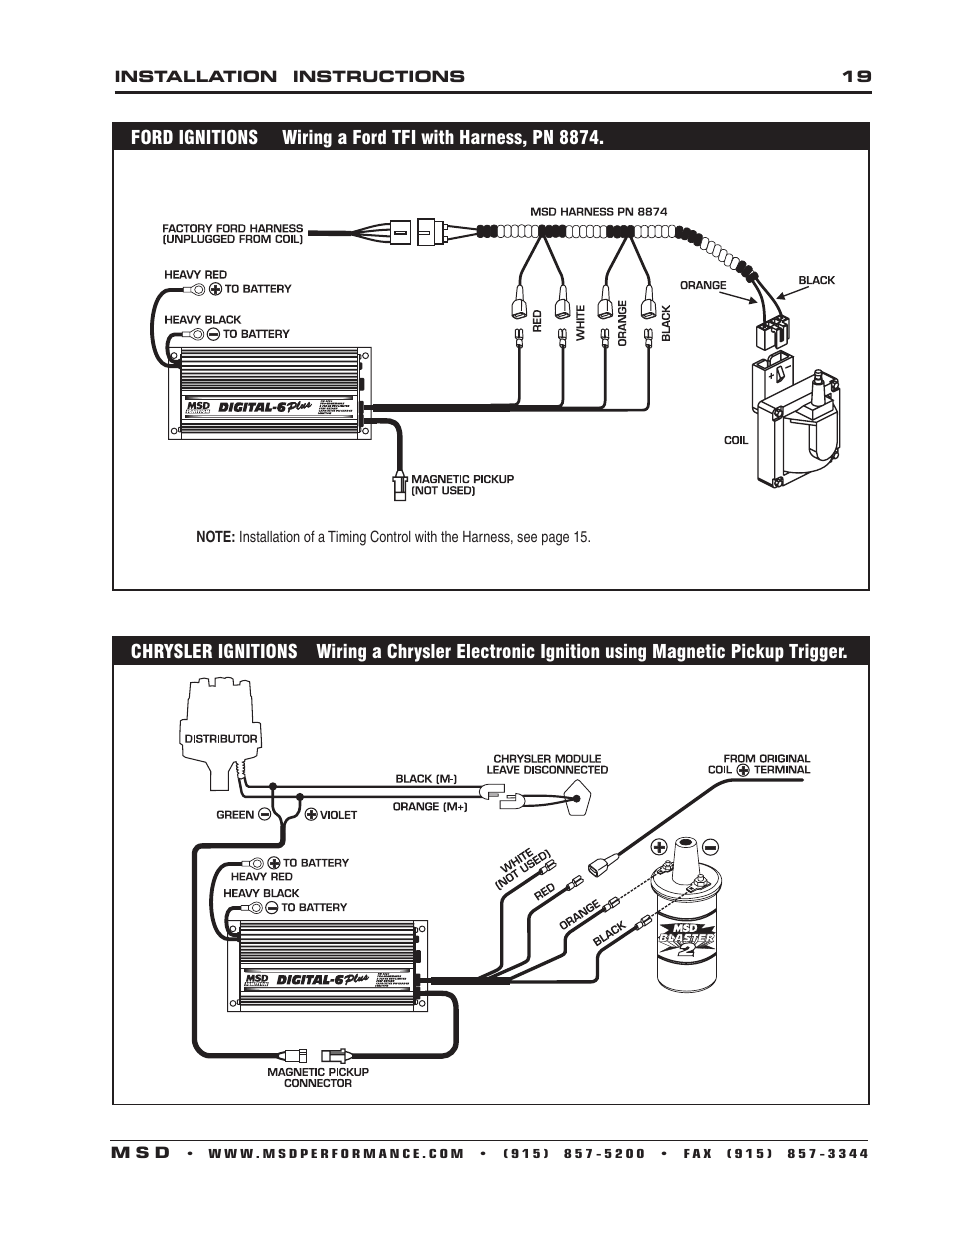 Msd 6al Wiring Diagram Mopar - Catalogue of Schemas Oem Chrysler Electronic Ignition Wiring Diagram on